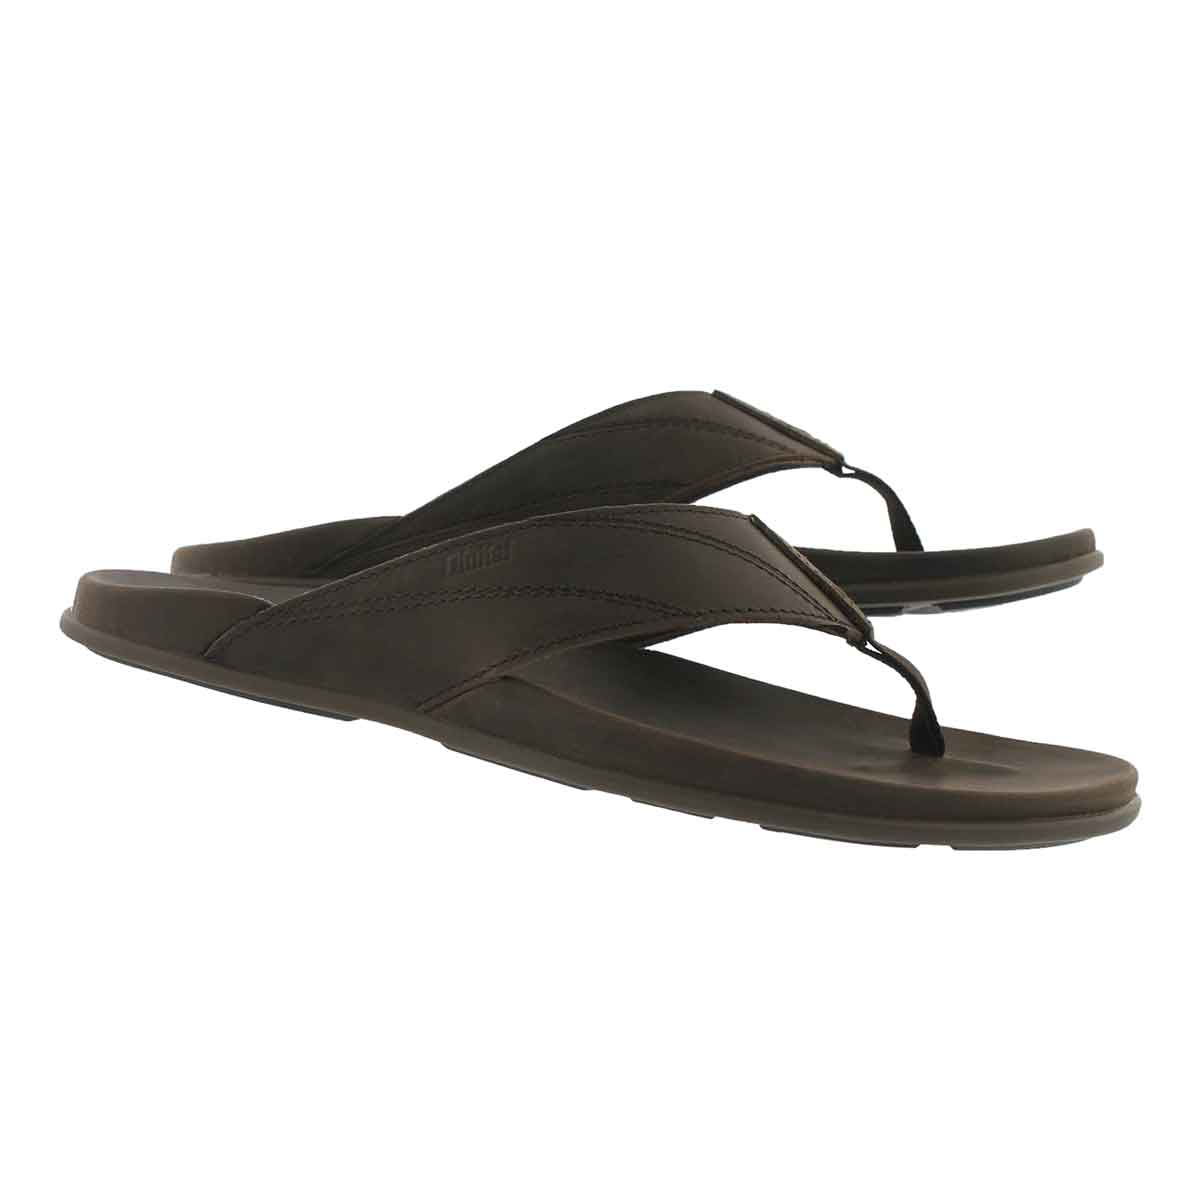 Mns Pikoi dark wood thong sandal